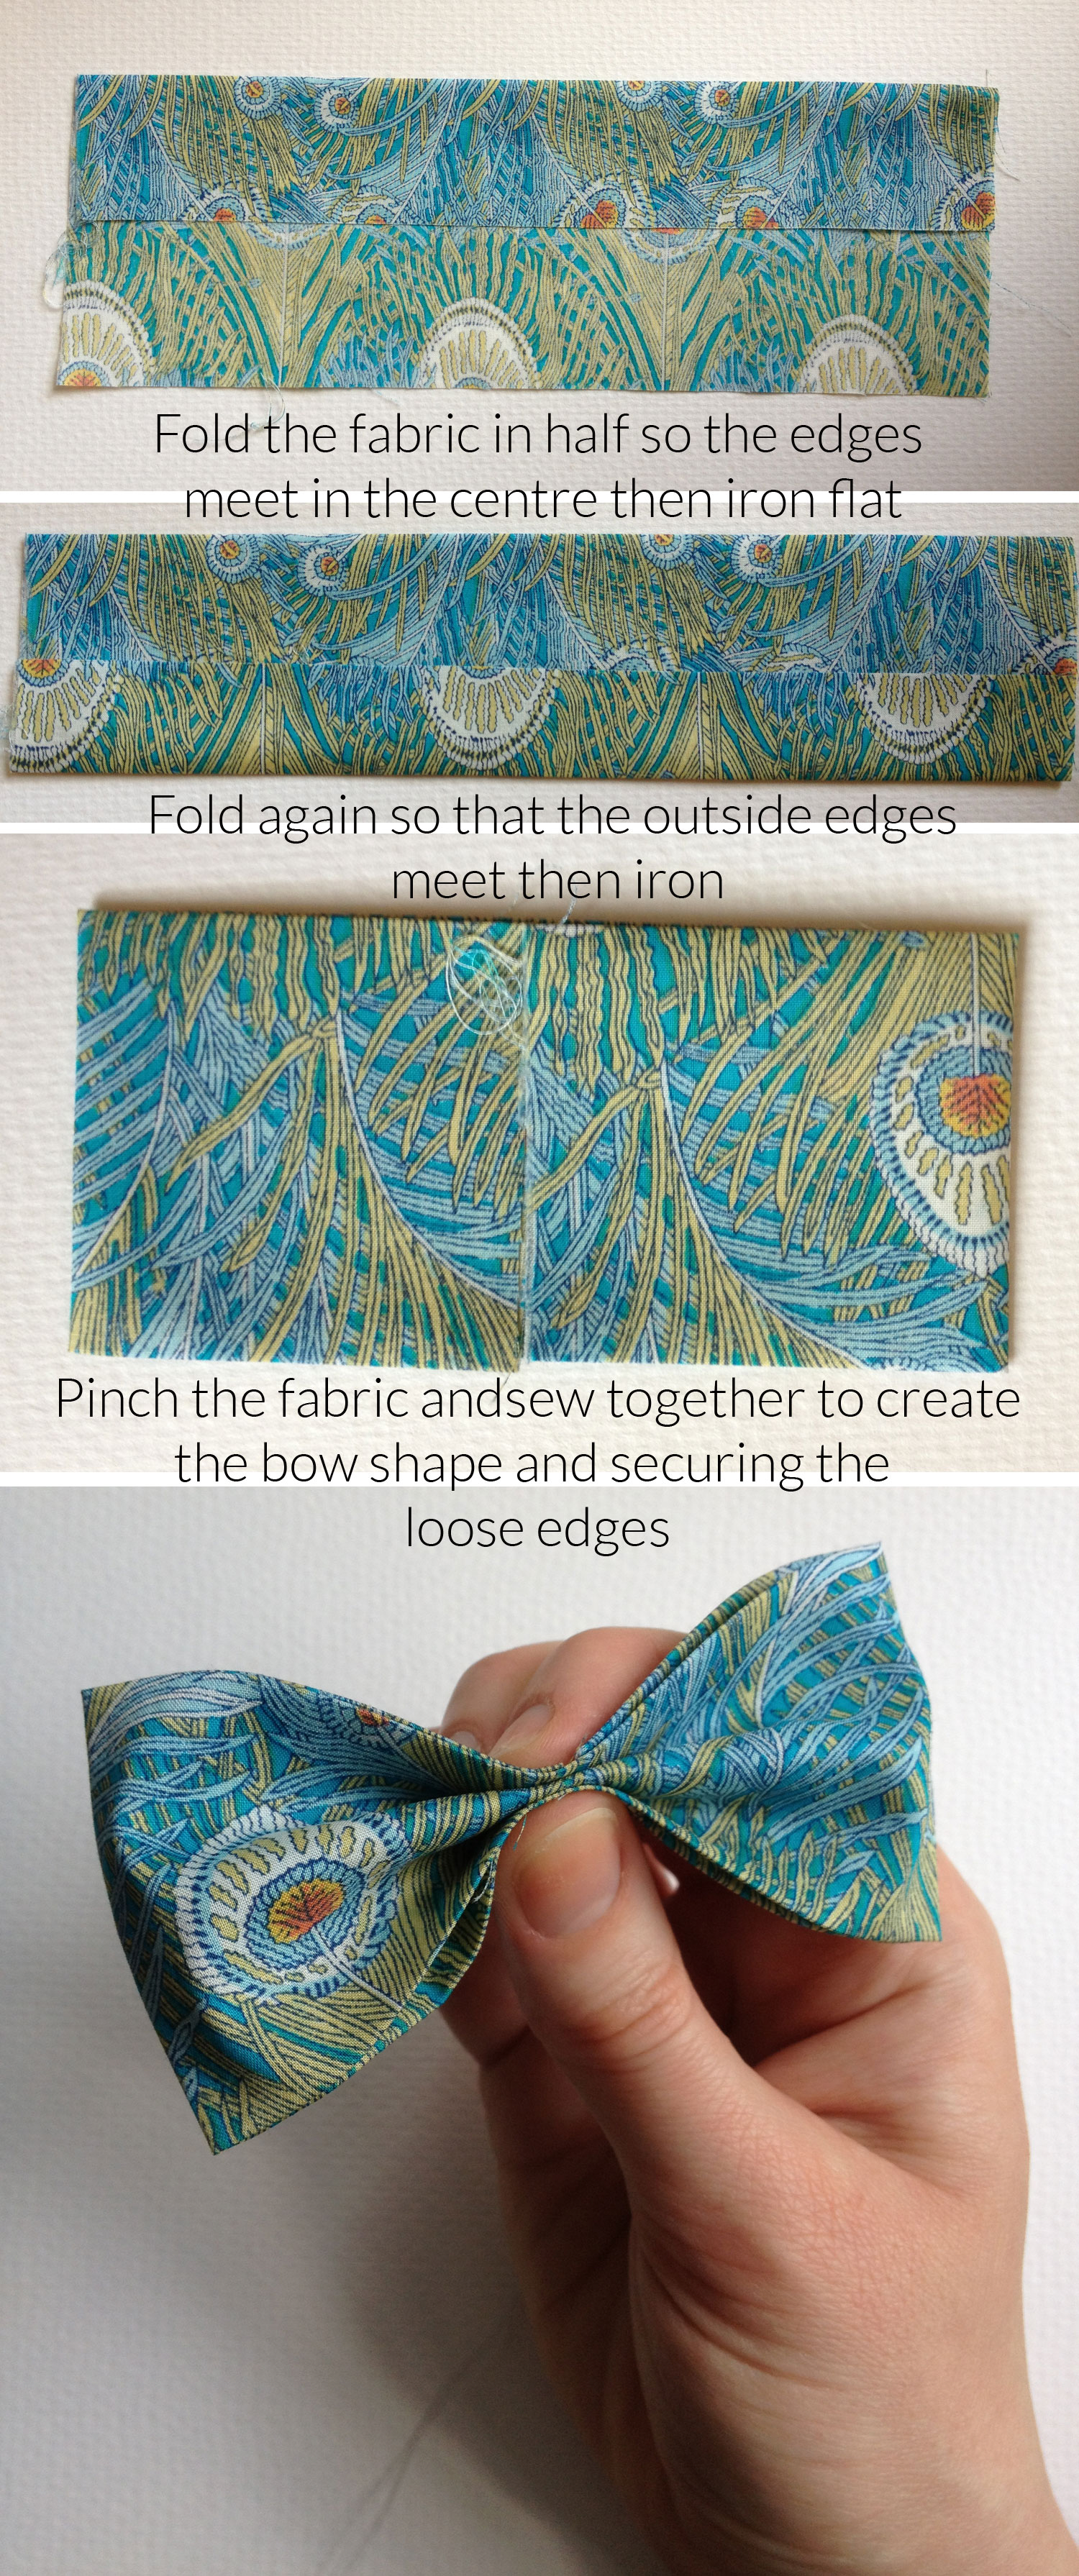 Folding-to-make-bow